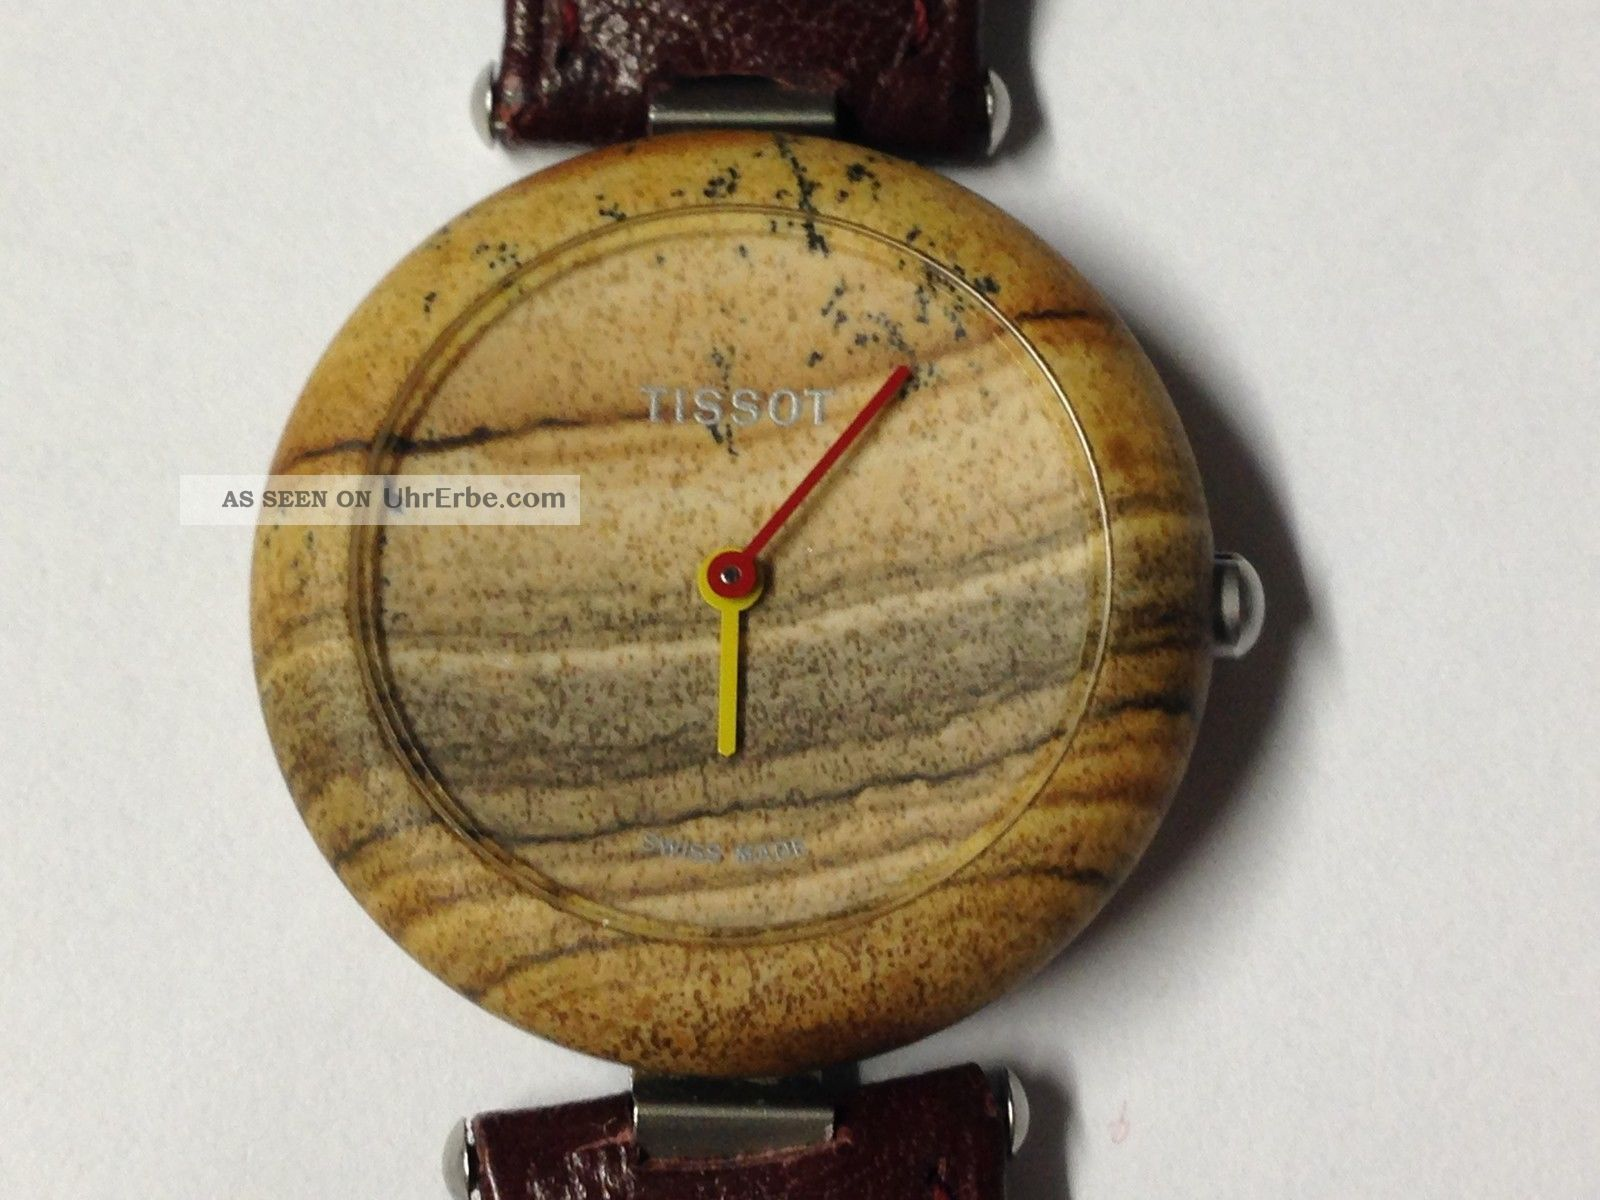 Tissot Rock Watches